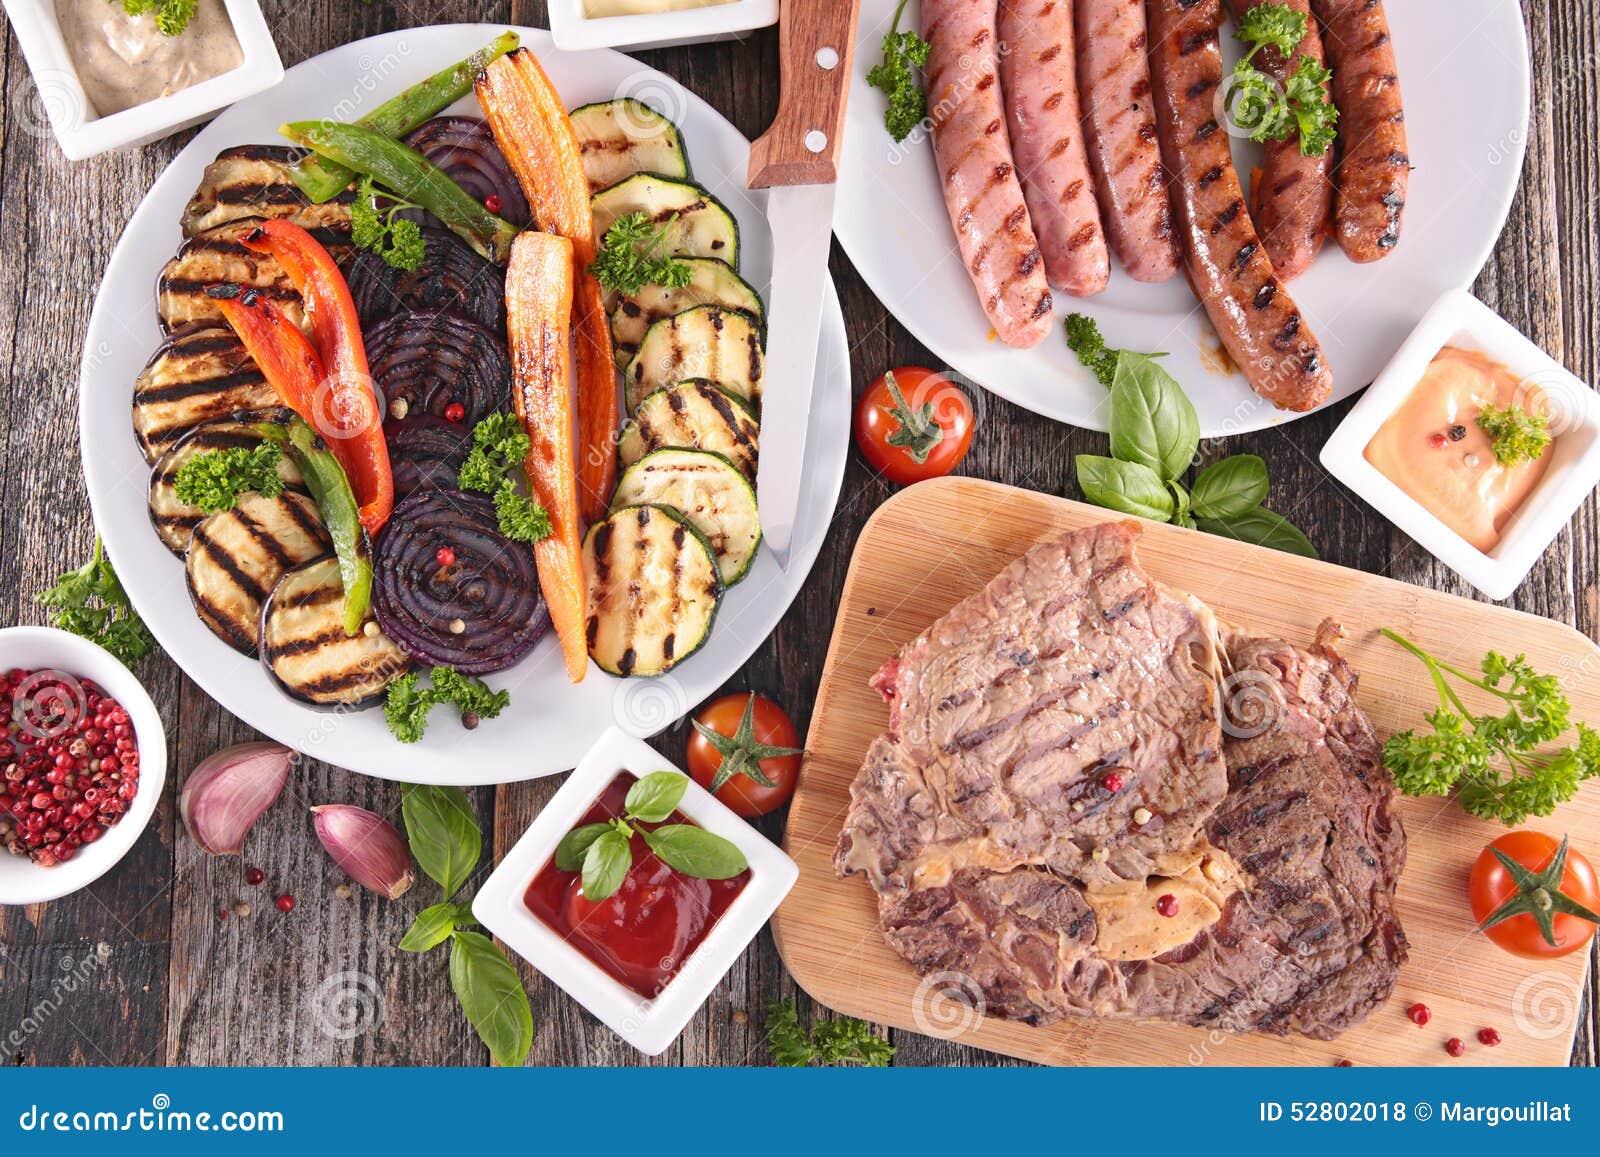 barbecue repas